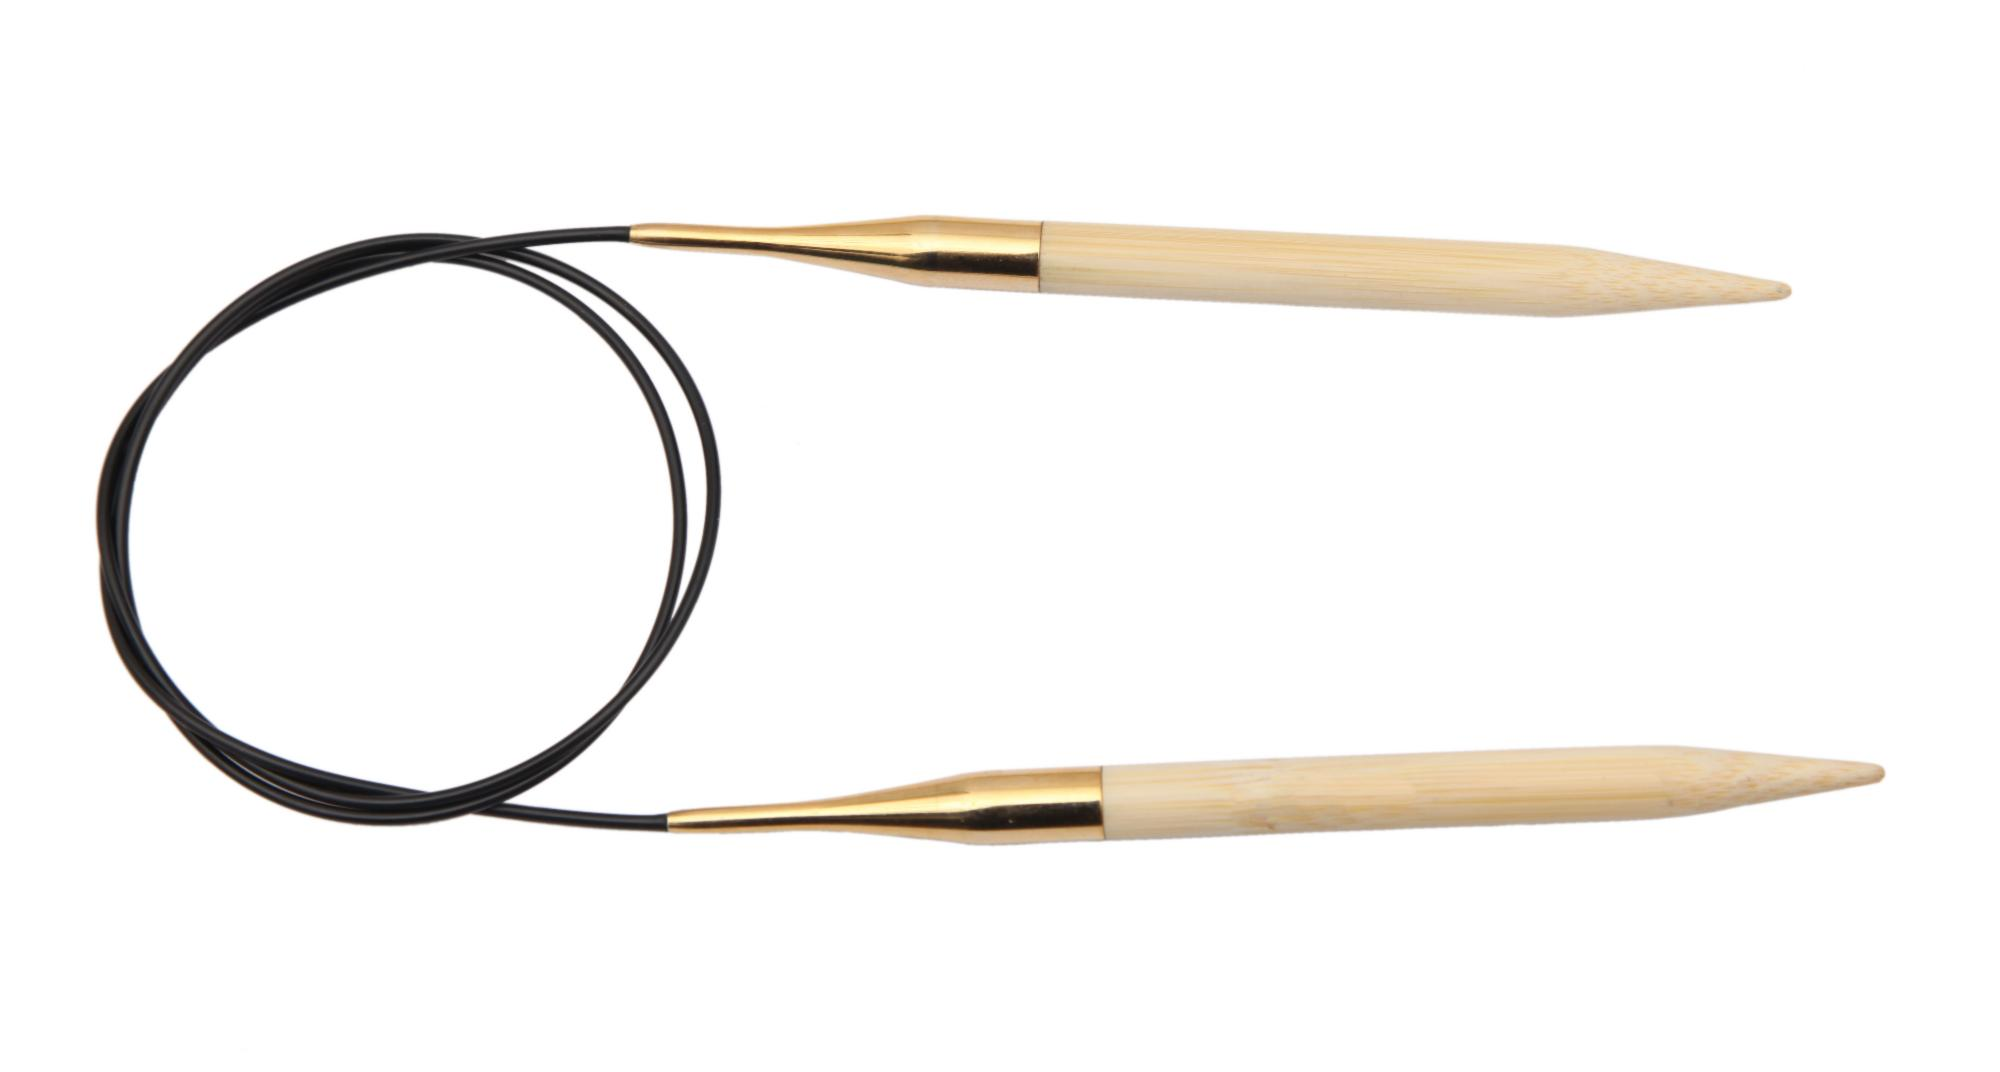 Спицы круговые 40 см Bamboo KnitPro, 22202, 2.25 мм